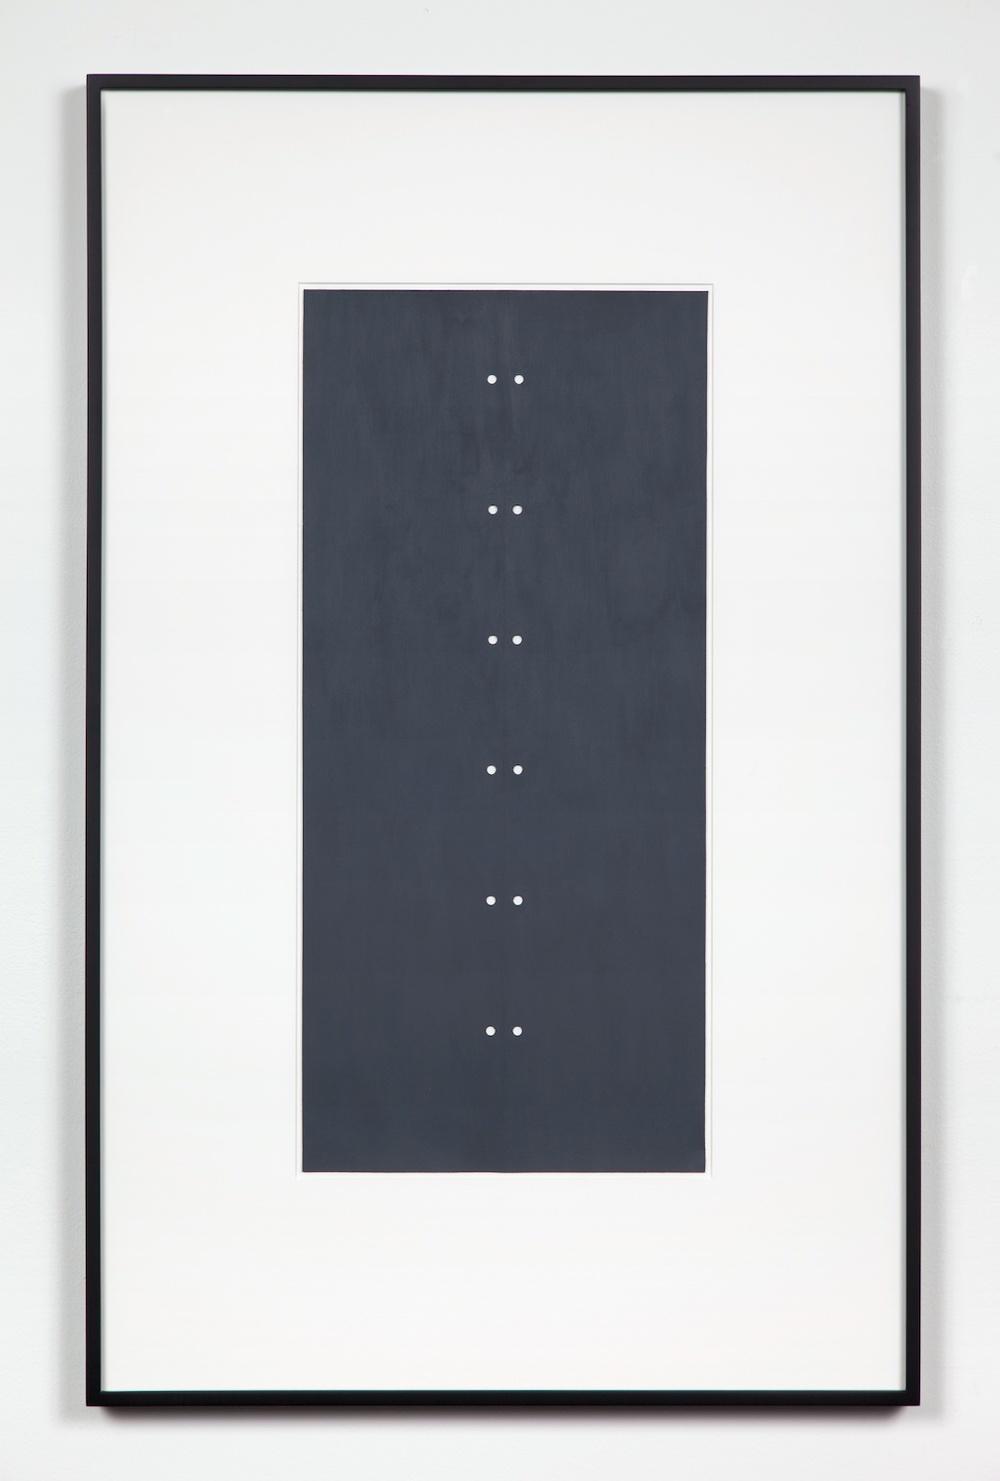 Lisa Williamson  Grey Eyelets  2011 Acrylic on paper 35h x 22w in LW080